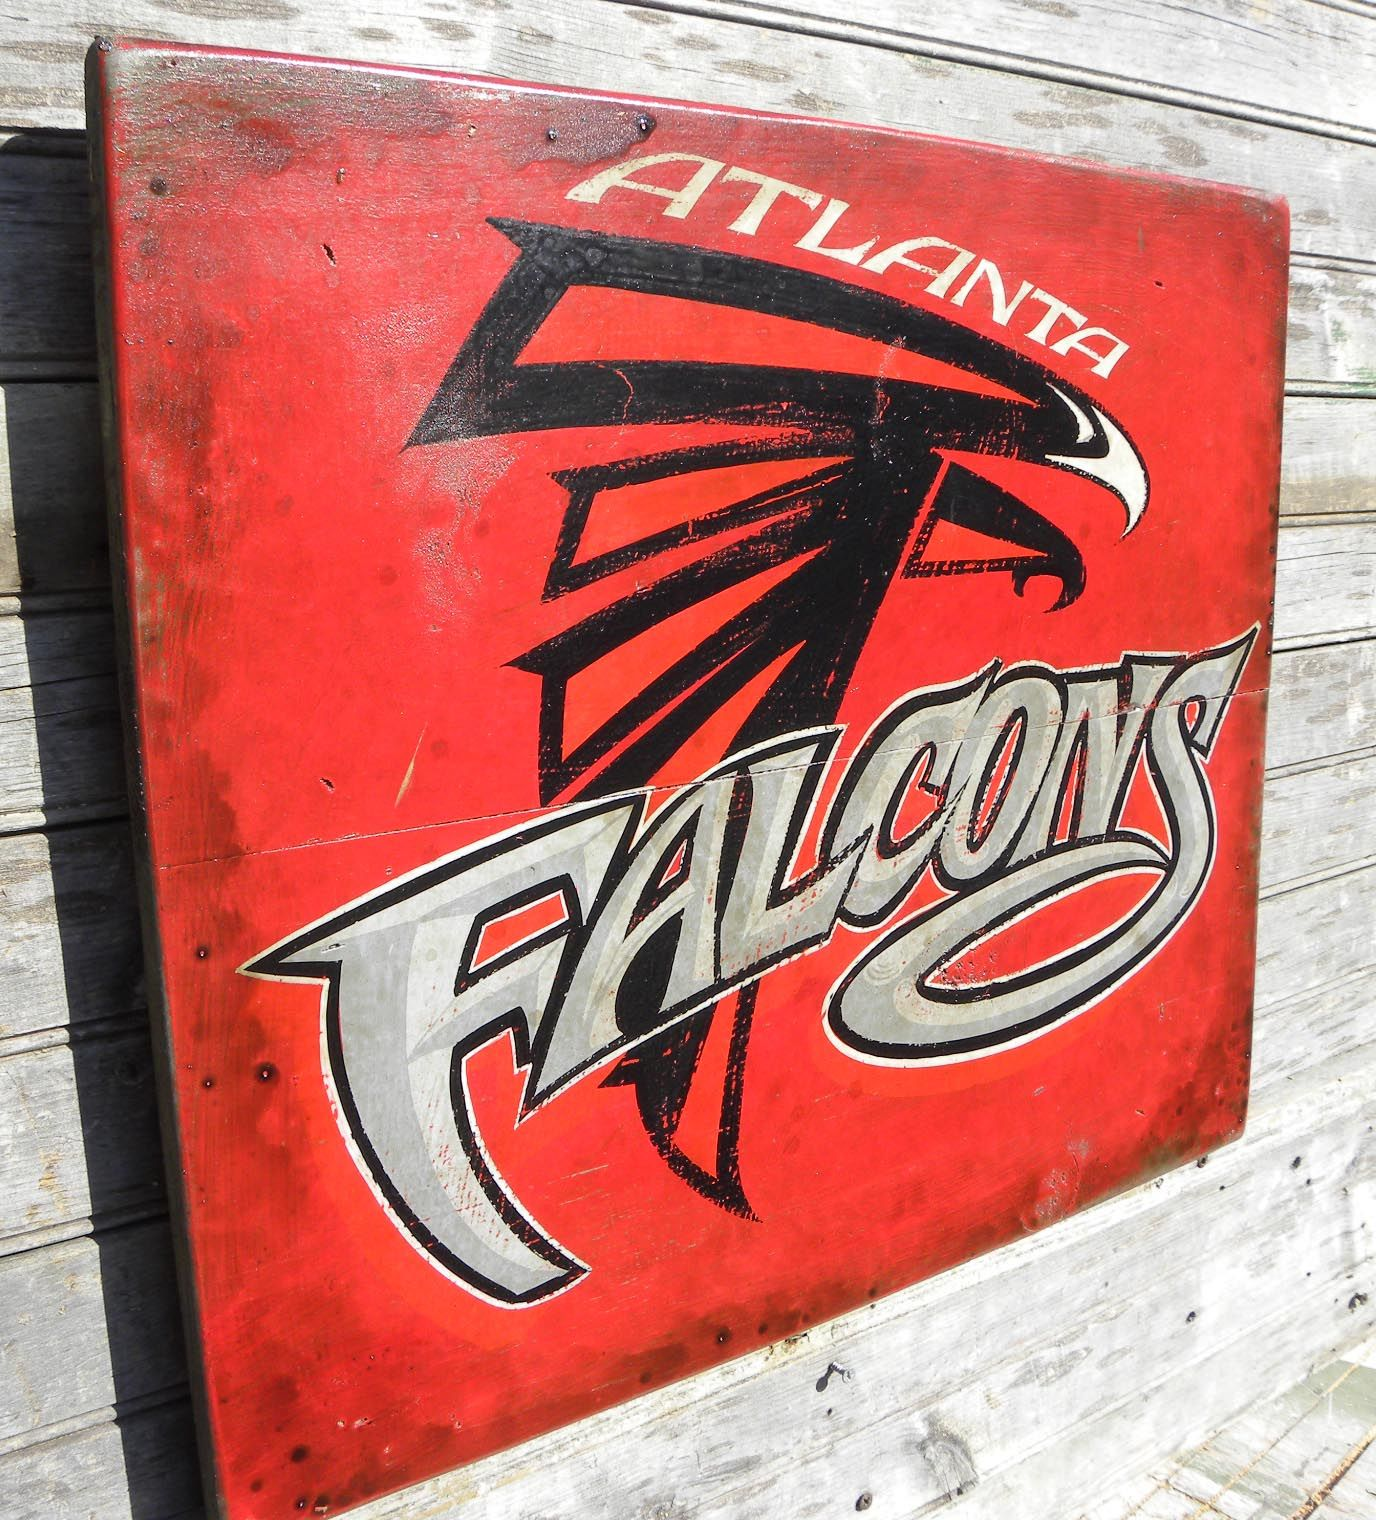 Falcon Fans Here S An Original Hand Painted Sign I Created On My Etsy Shop Zekesant Atlanta Falcons Painting Atlanta Falcons Man Cave Atlanta Falcons Memes